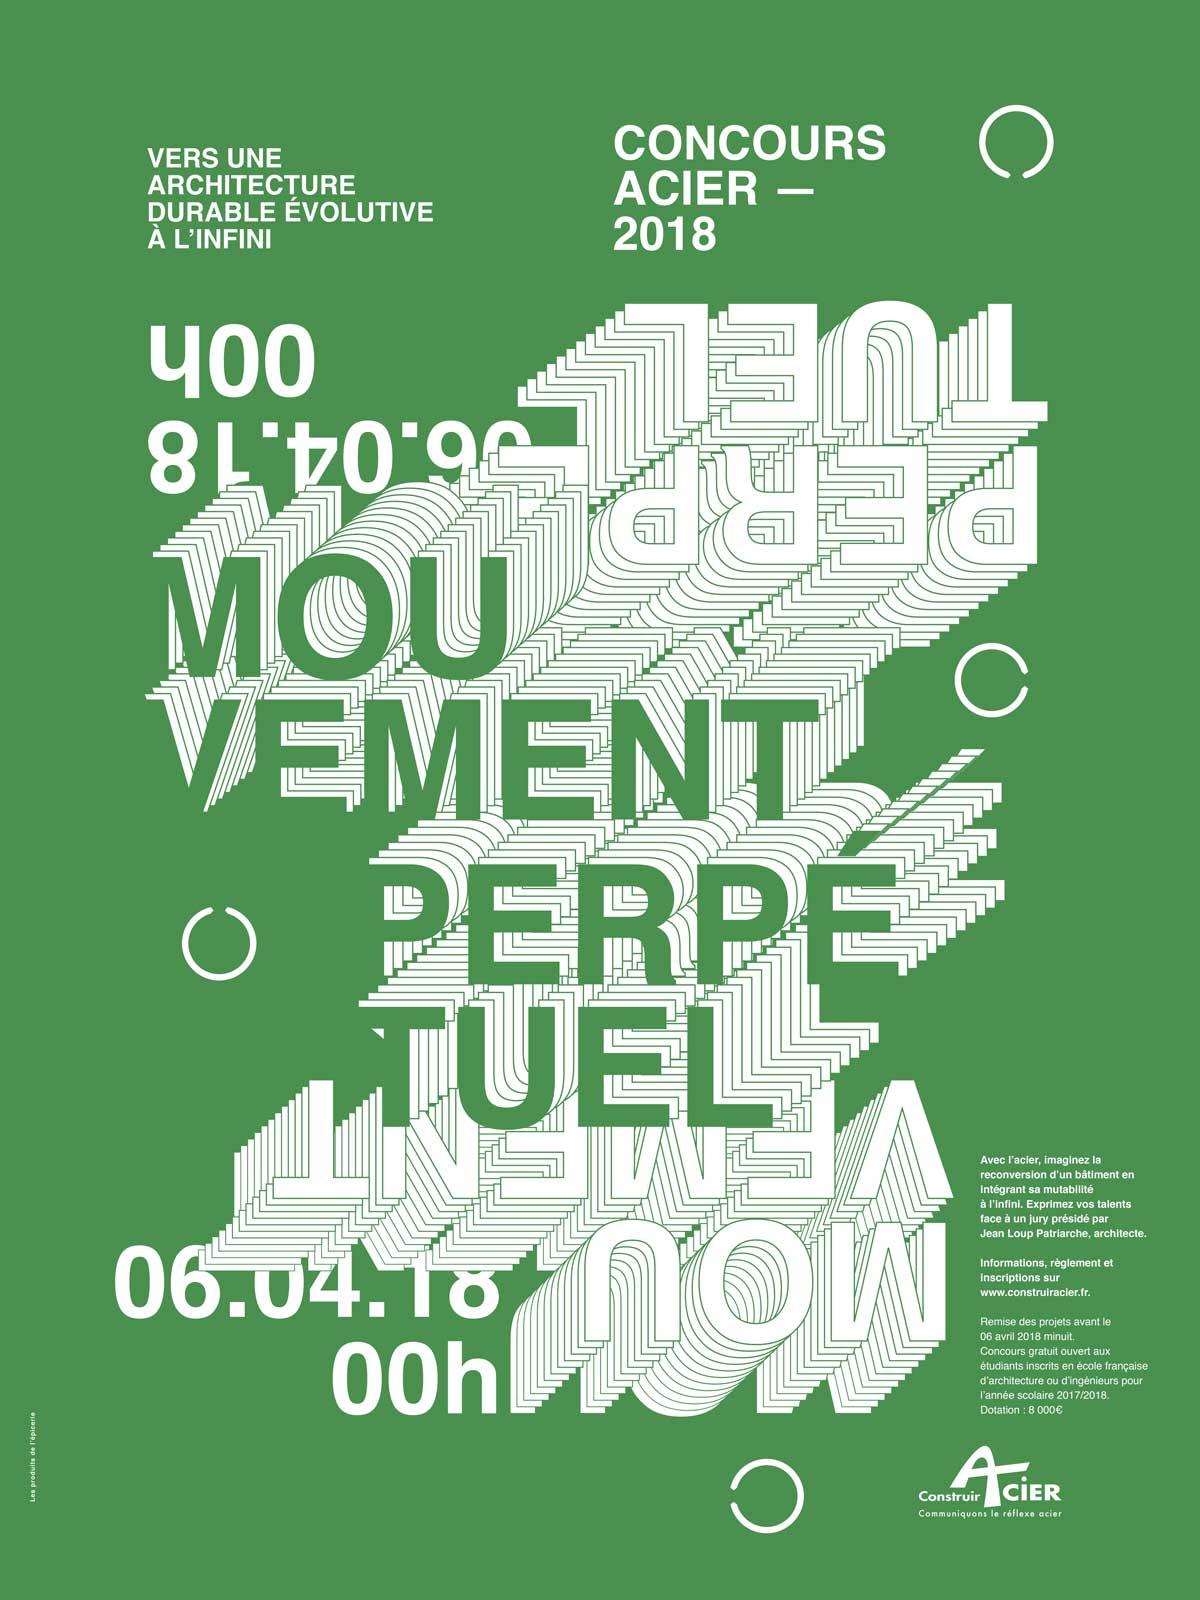 poster-acier-2018